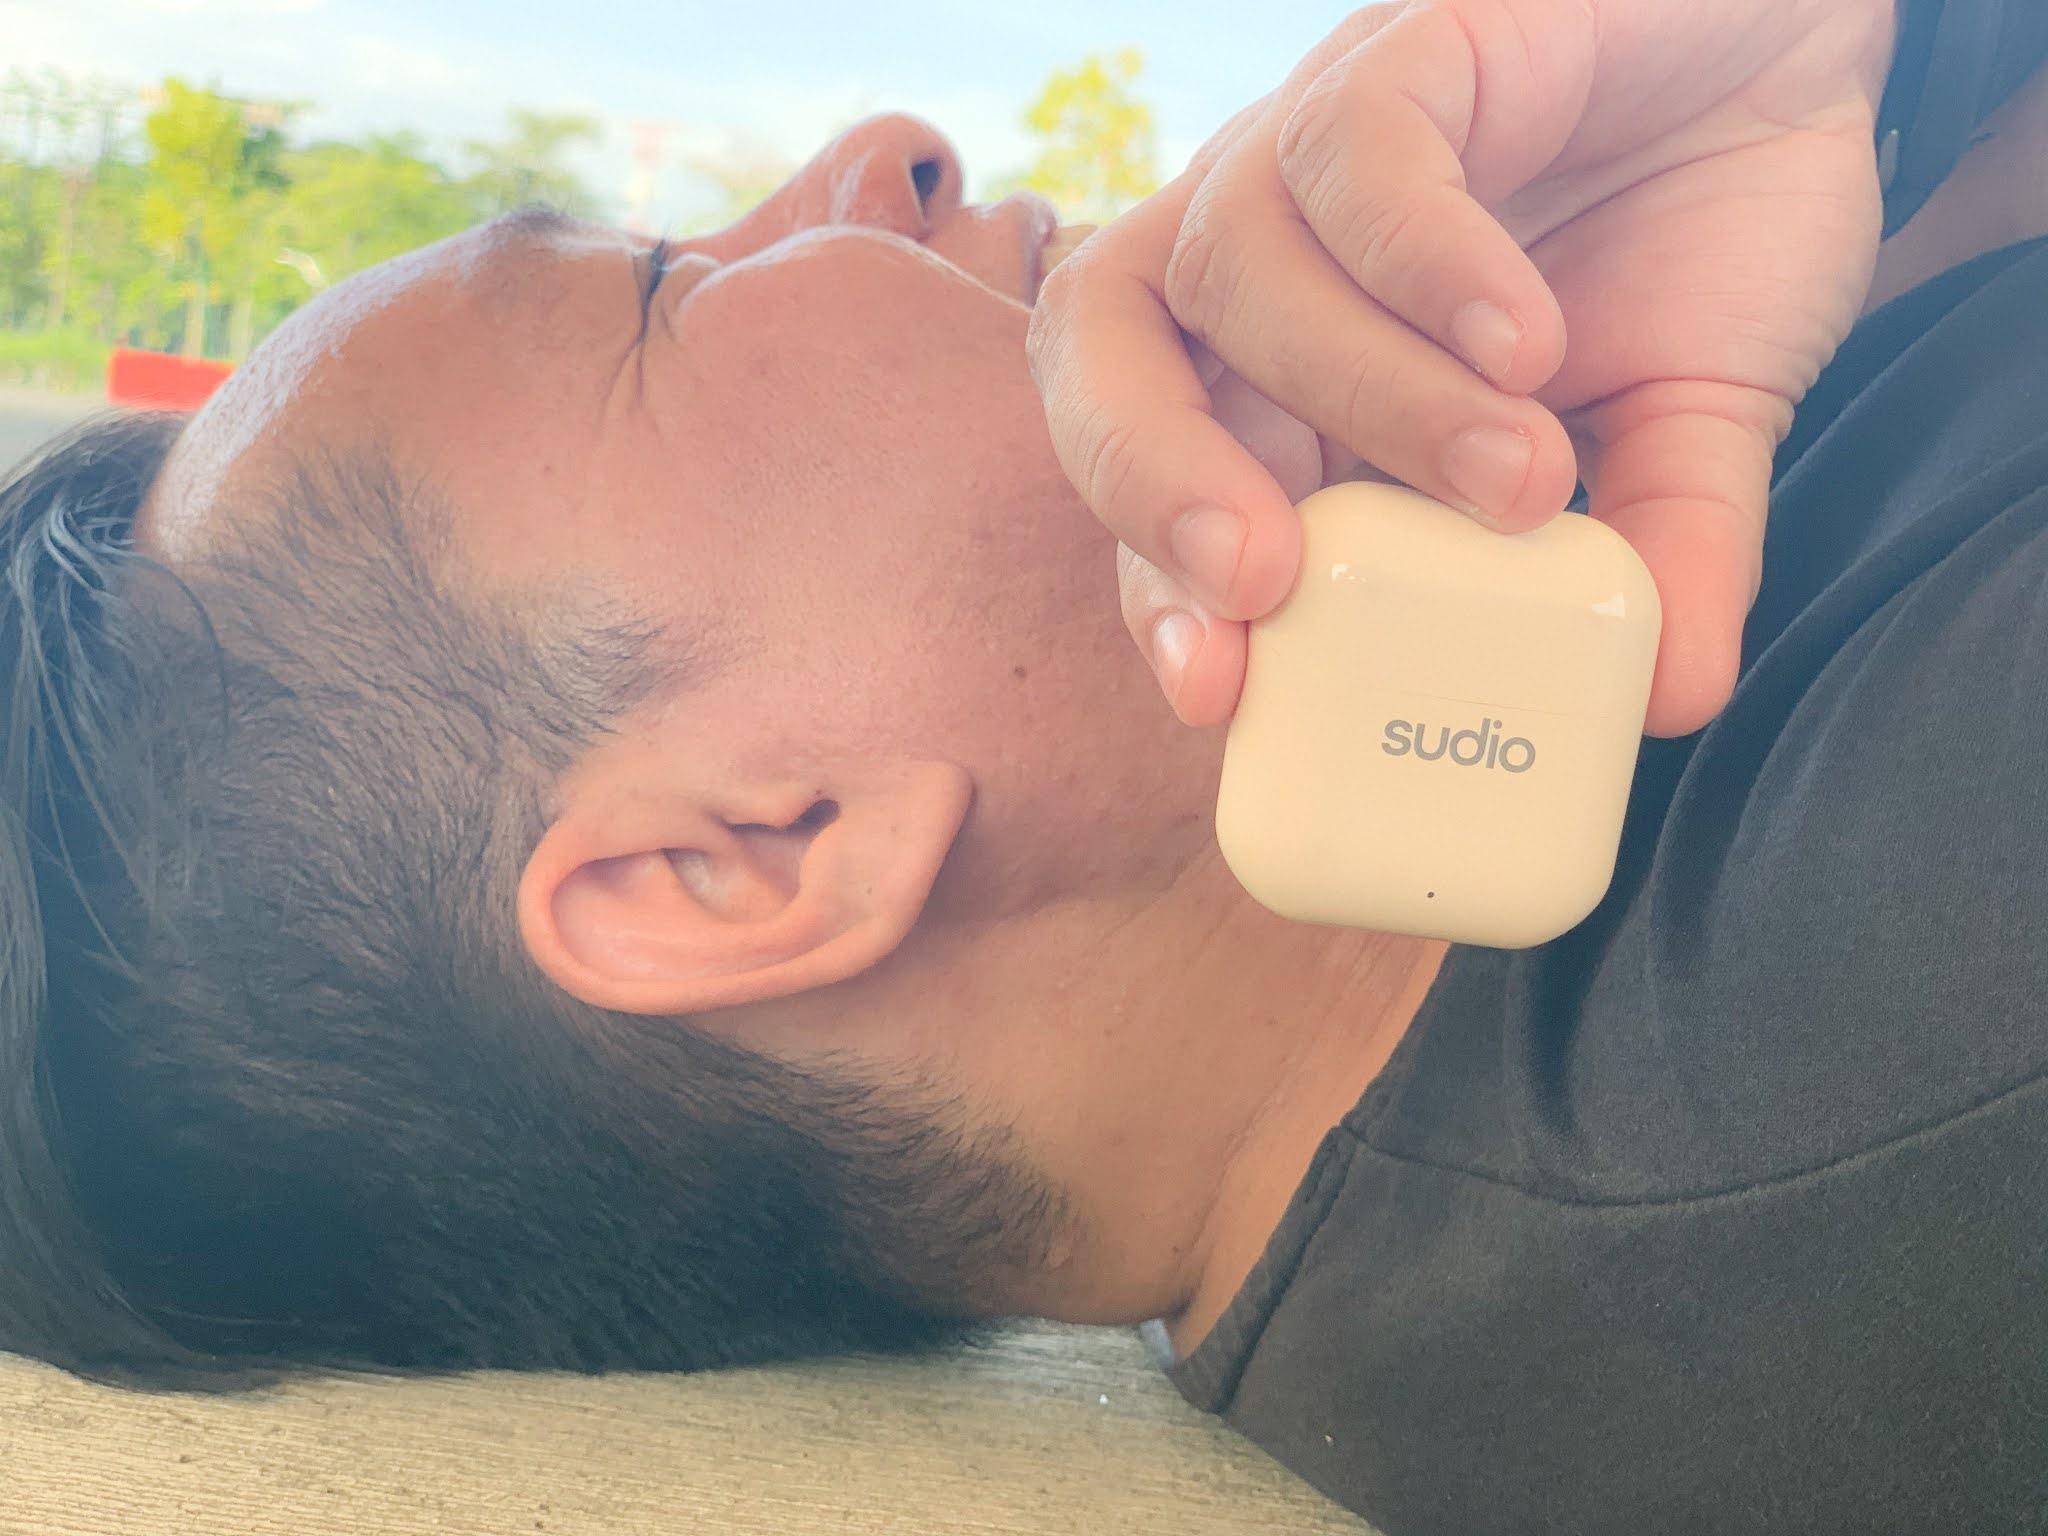 Sudio NIO, Sudio, Shaping Sound, Sudio Moments, NIO, Rawlins GLAM, Rawlins Lifestyle,Rawlins Tech